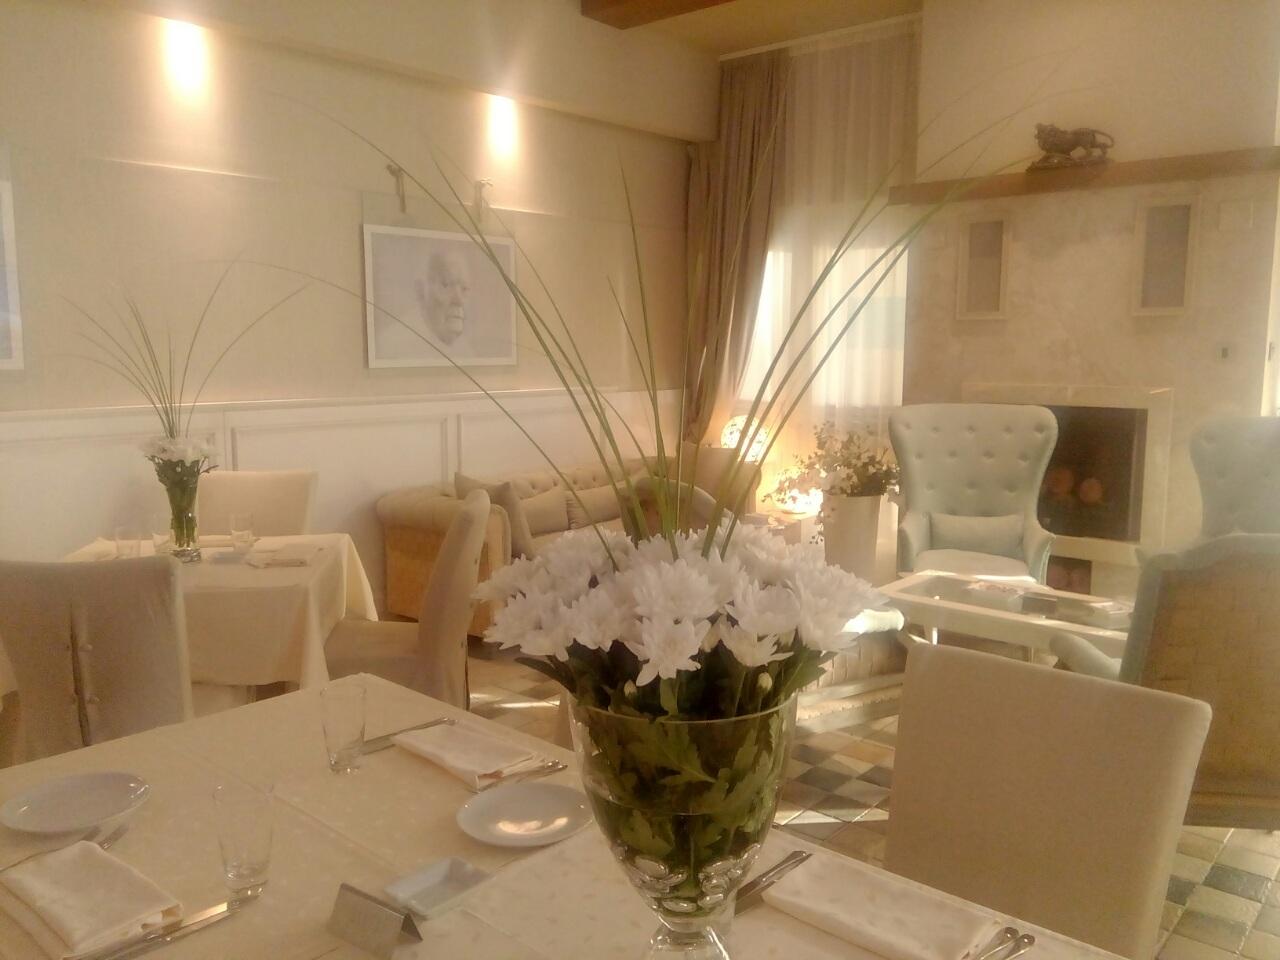 Restoran-Bagdala-Krusevac-041